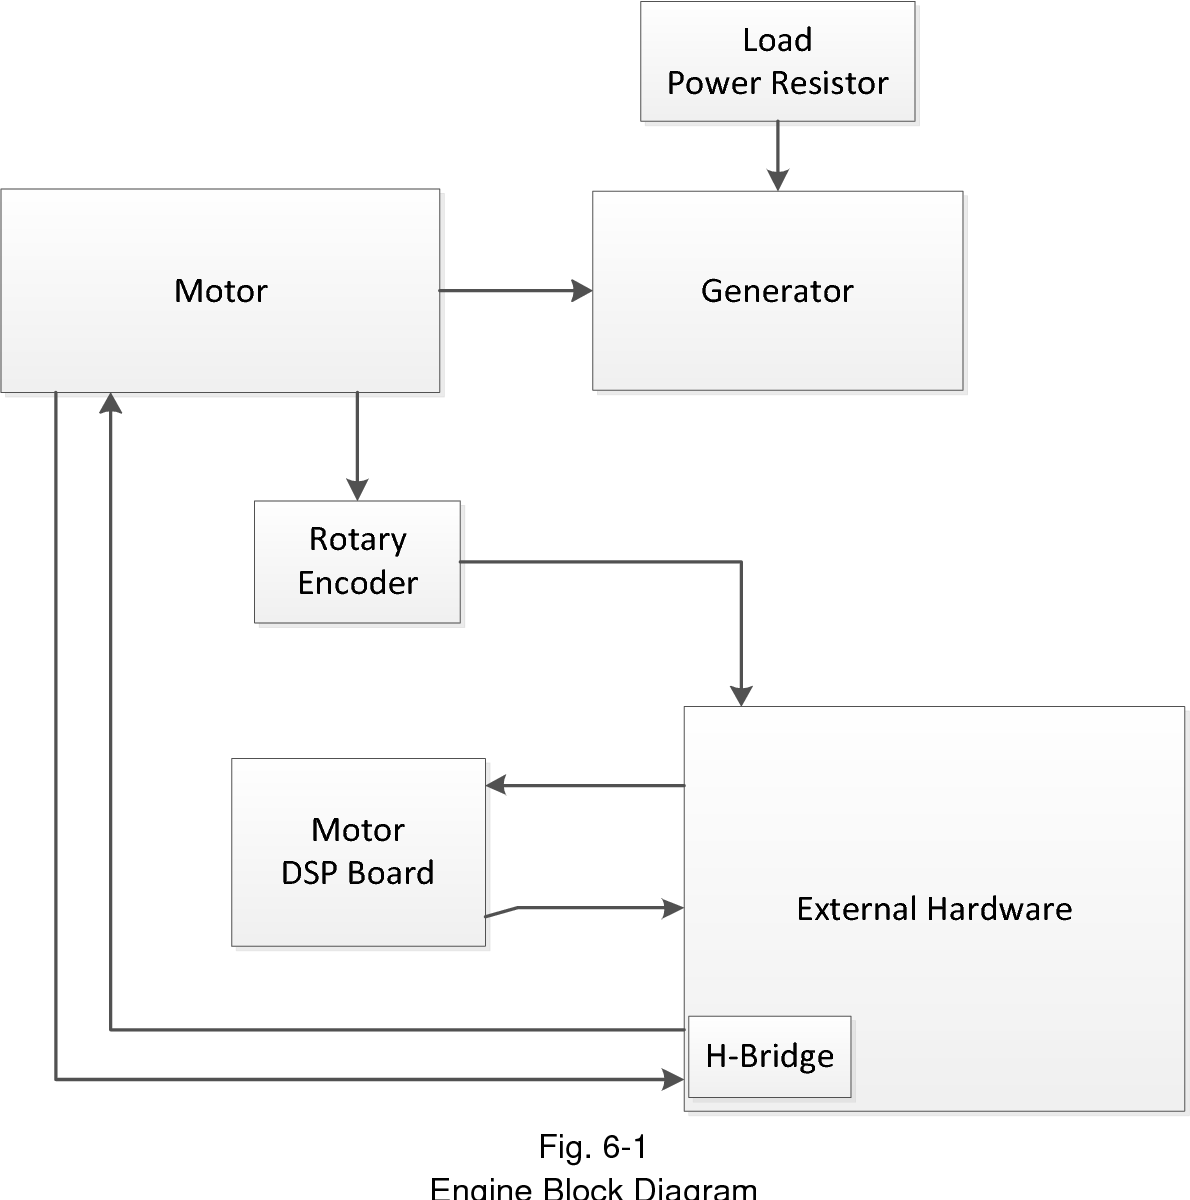 hight resolution of 6 1 engine block diagram